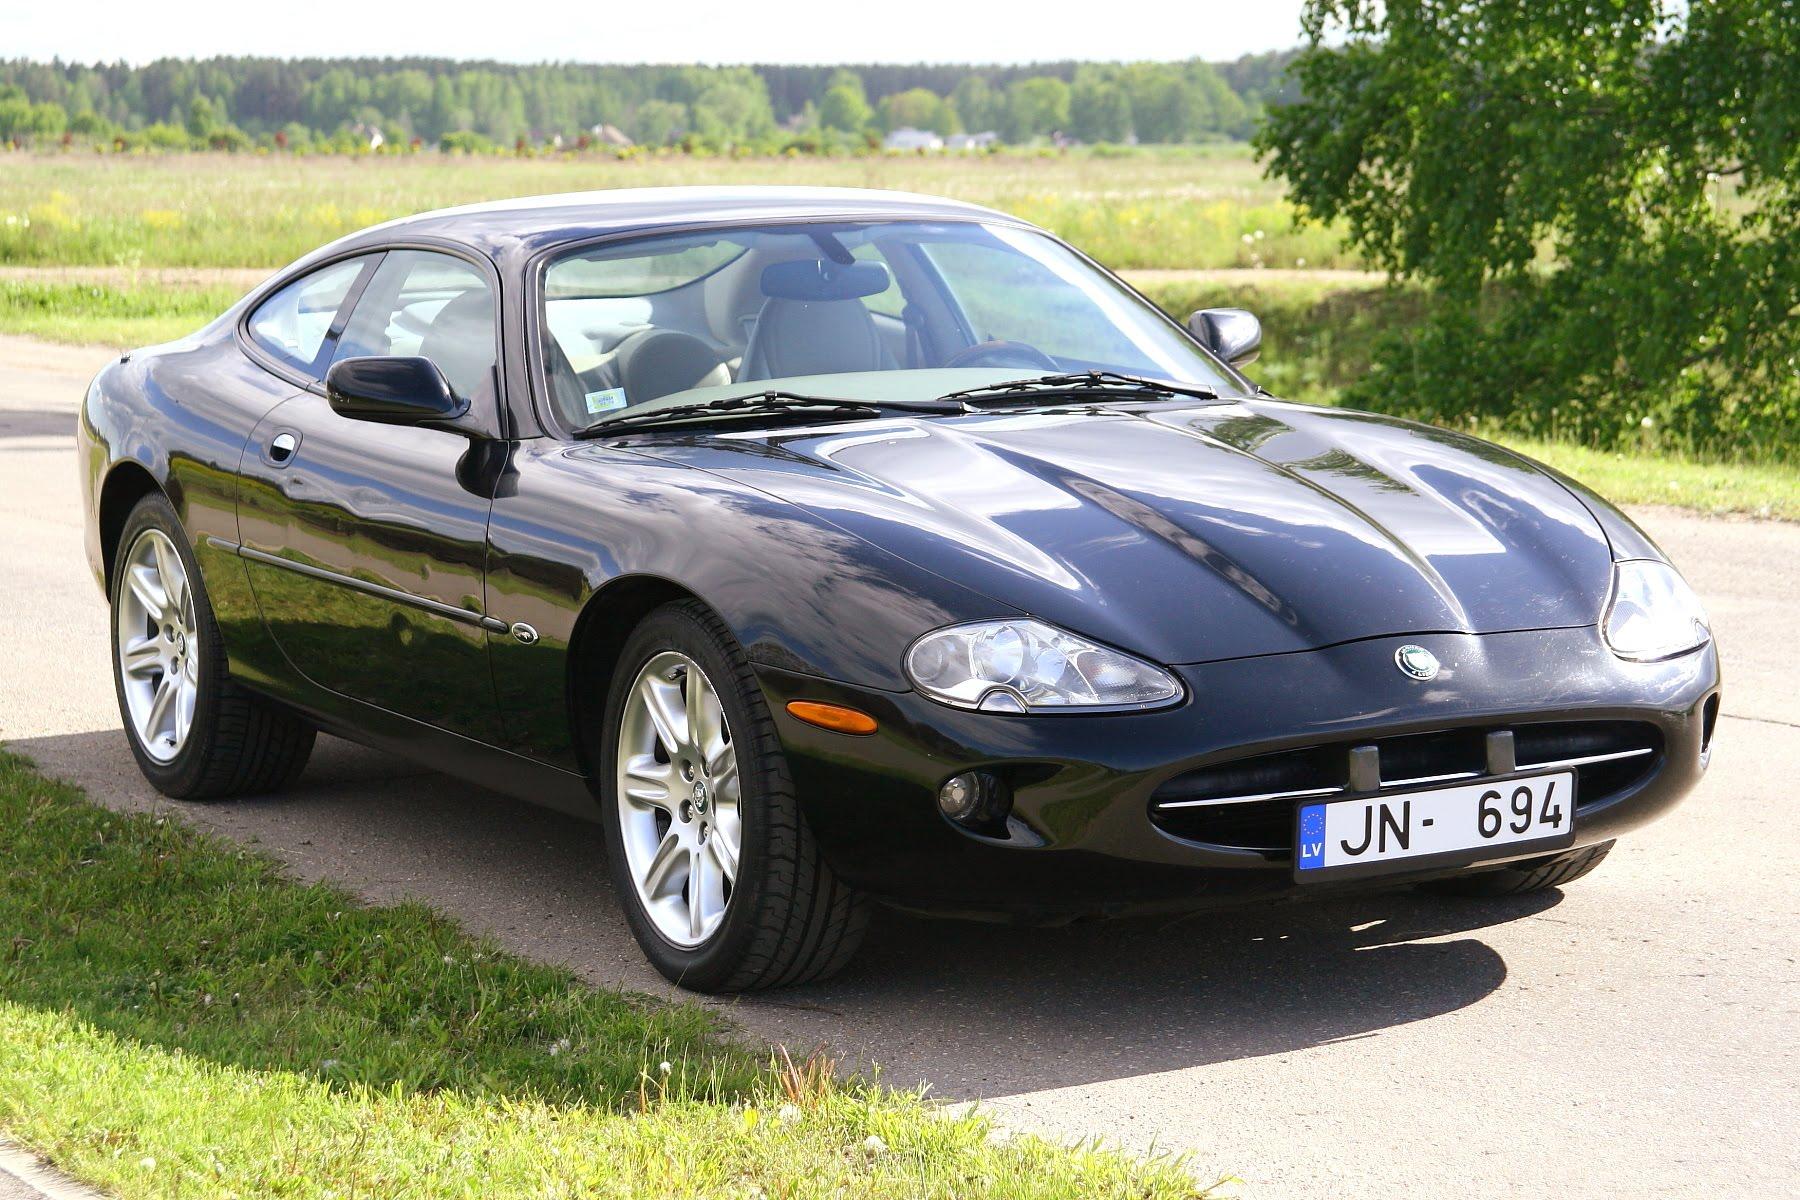 2000 Jaguar XK8 4.0 V8 LPG